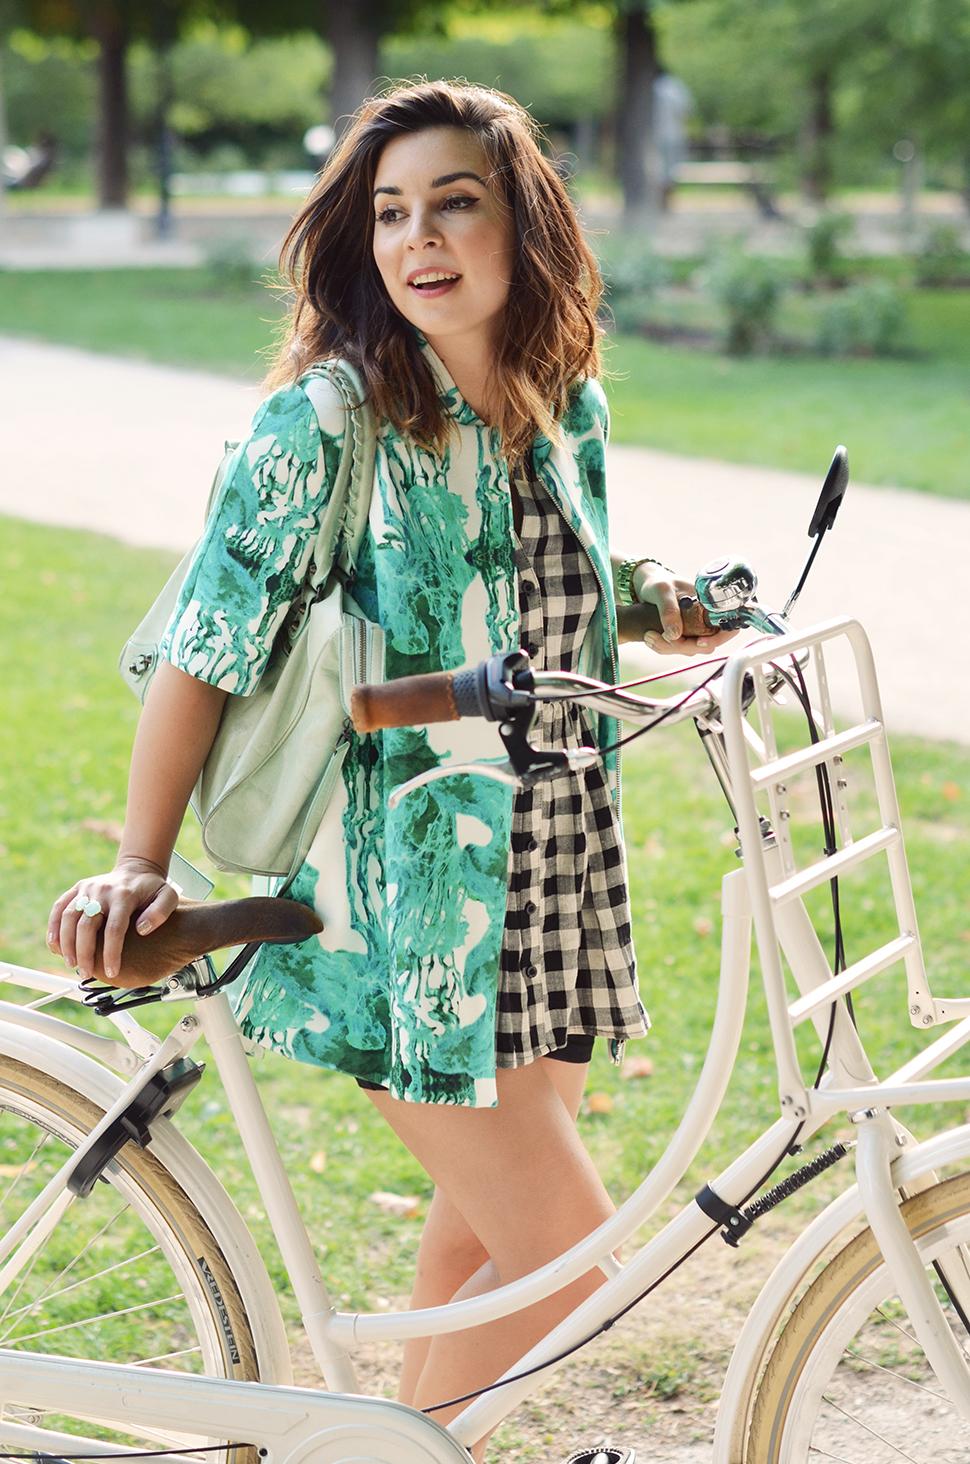 Helloitsvalentine_Anthropologie_look_bike_7